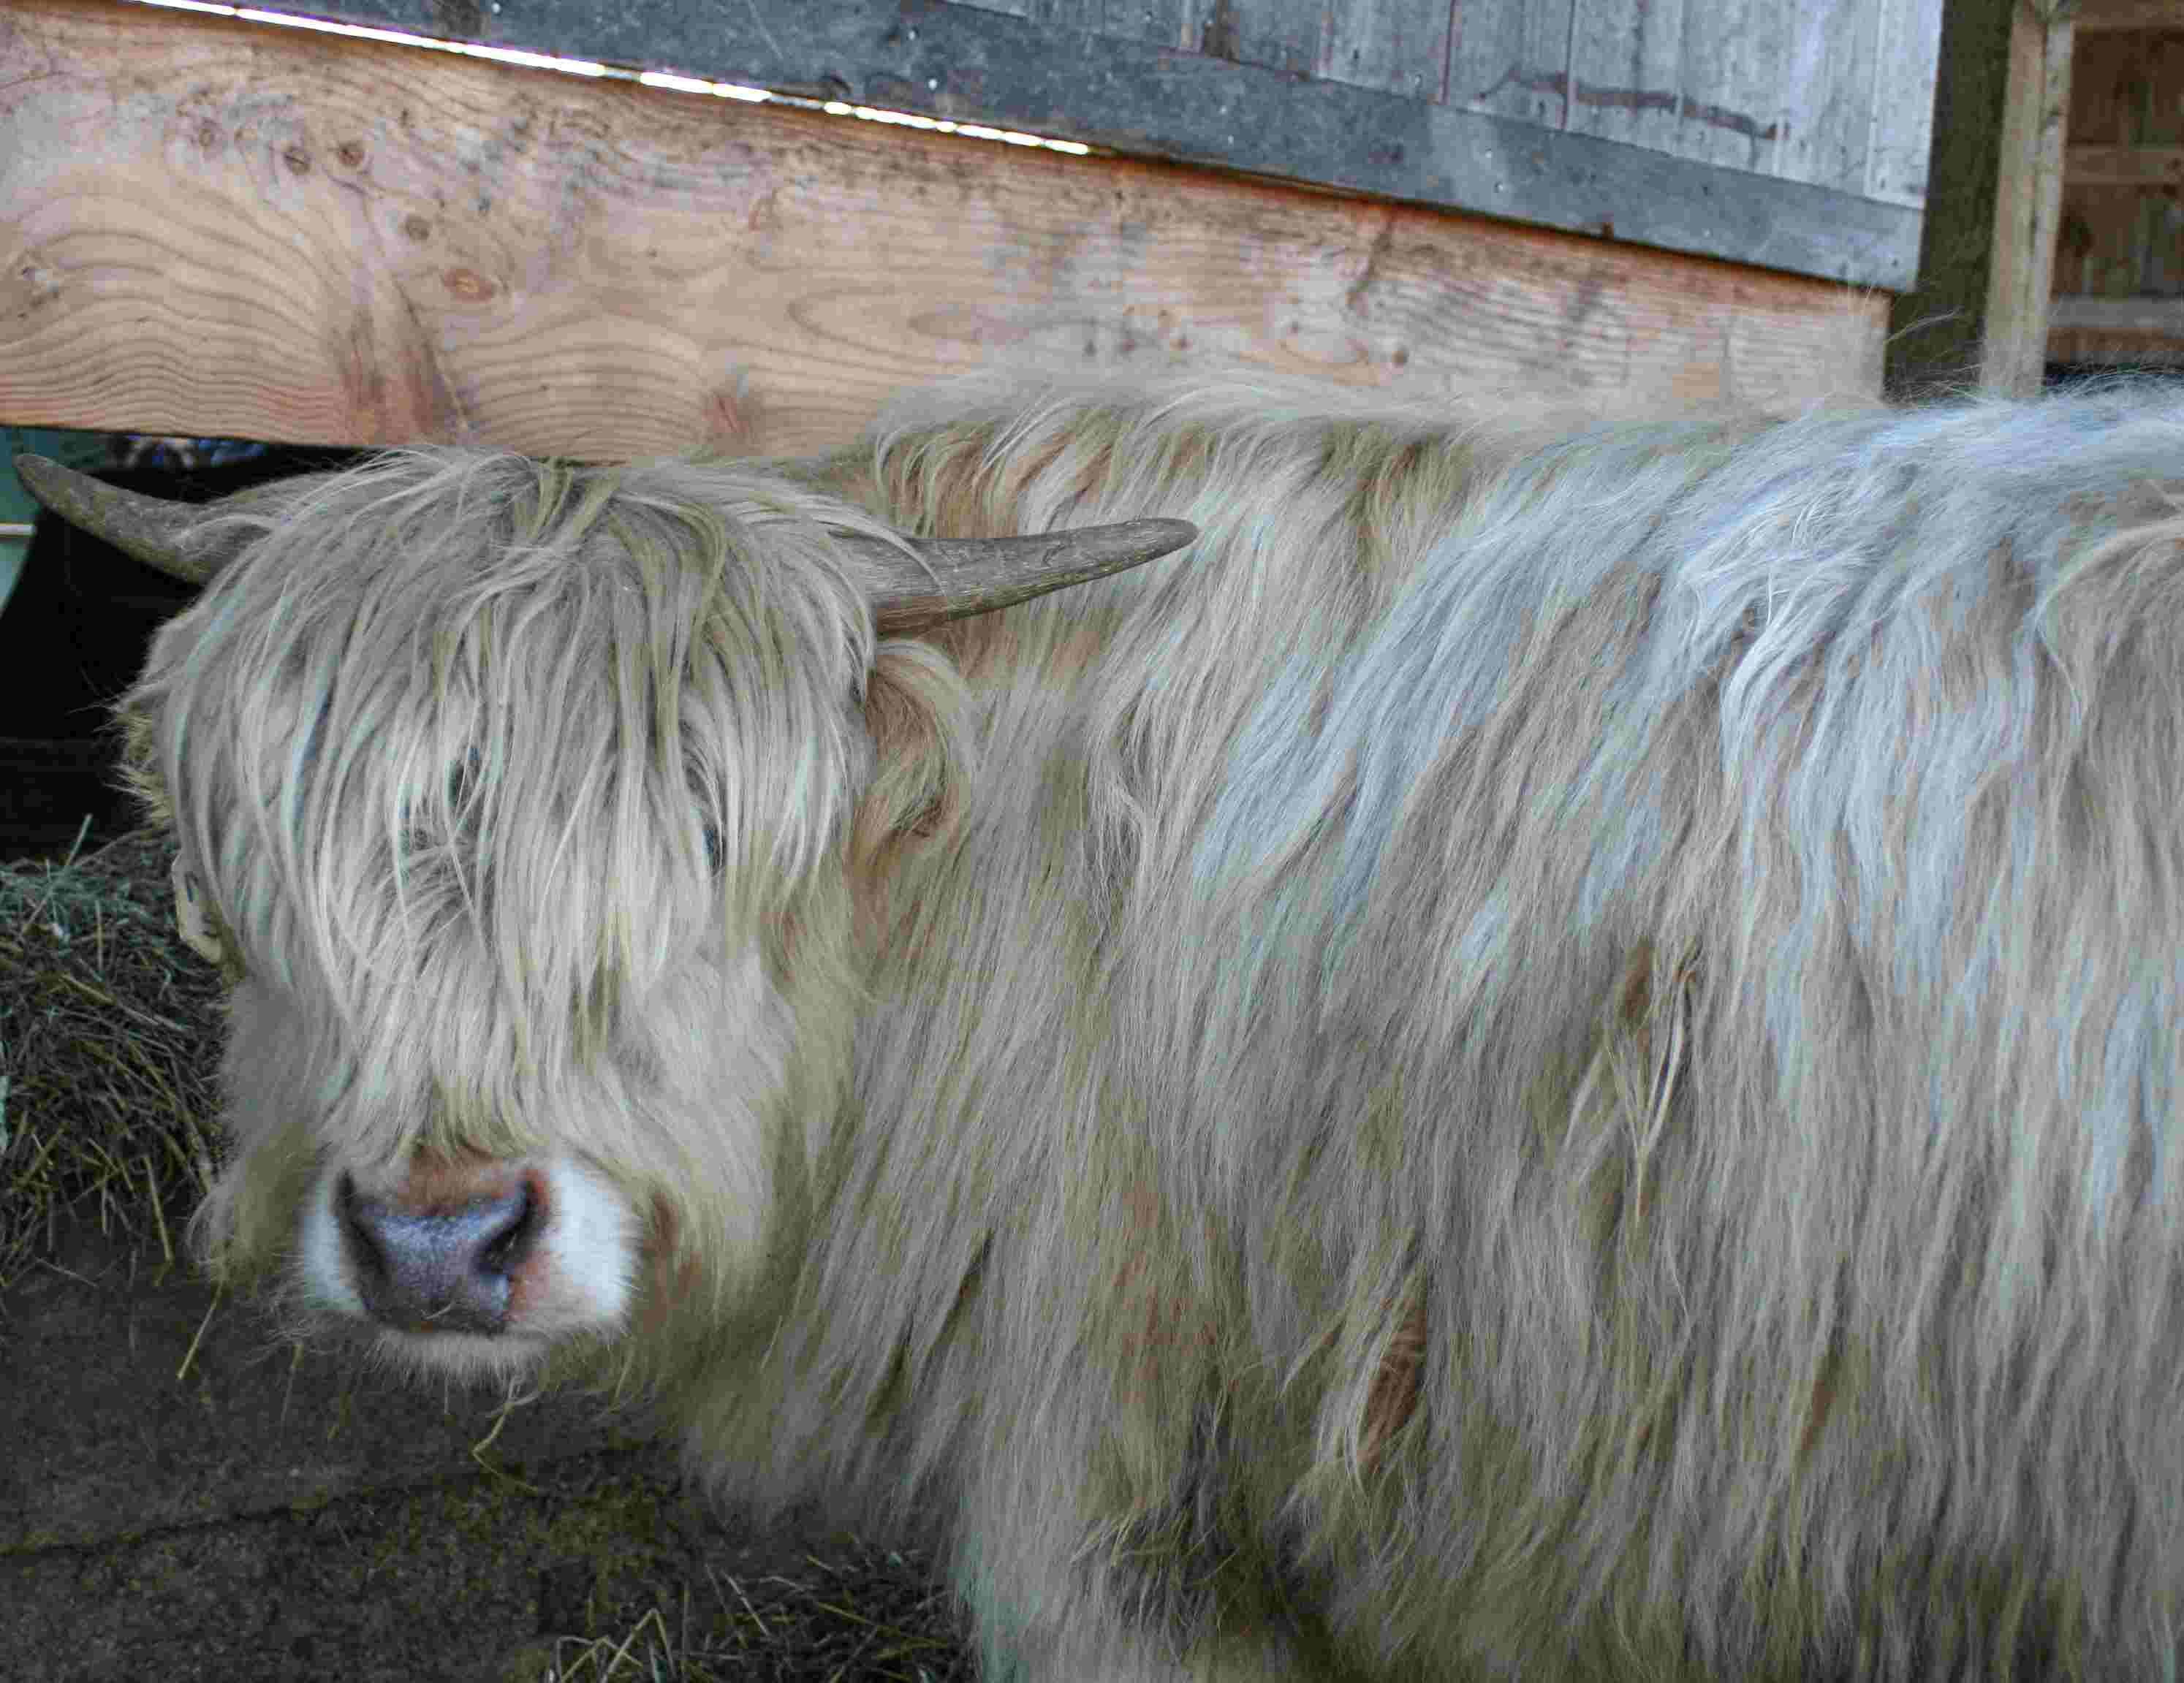 Murray Scott - 1 1/2-year-old Scottish Highlander Steer - $1500